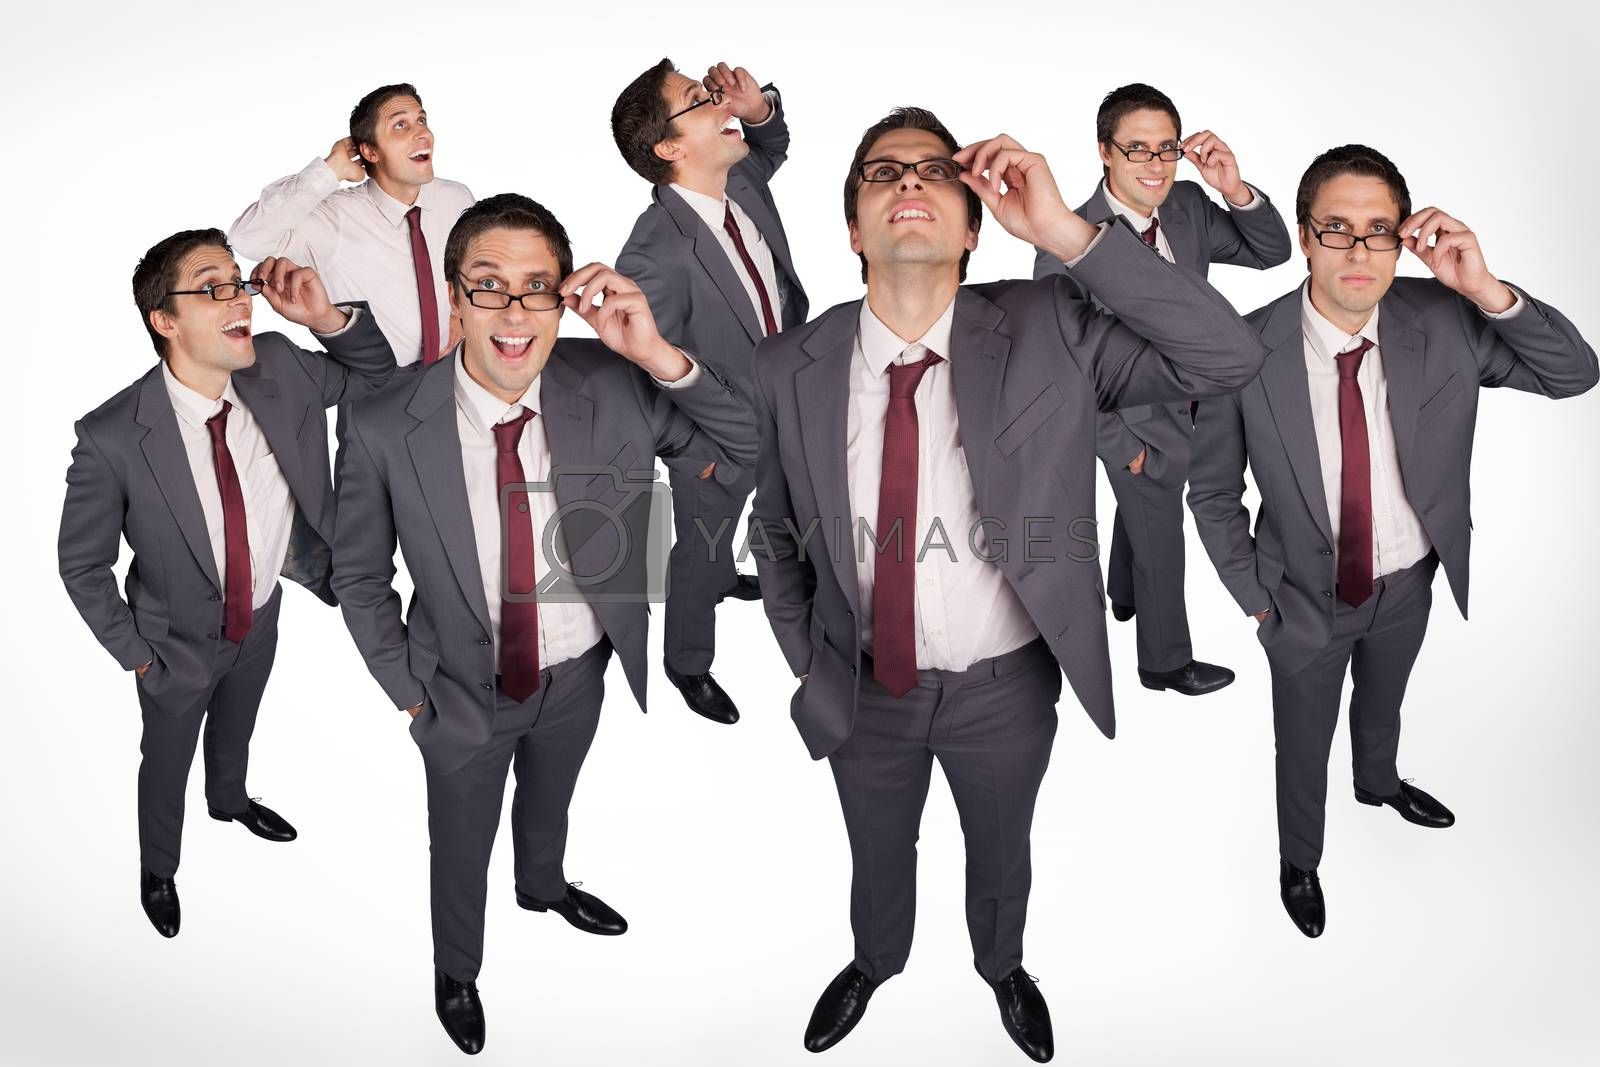 Royalty free image of Varied emotions of businessman by Wavebreakmedia